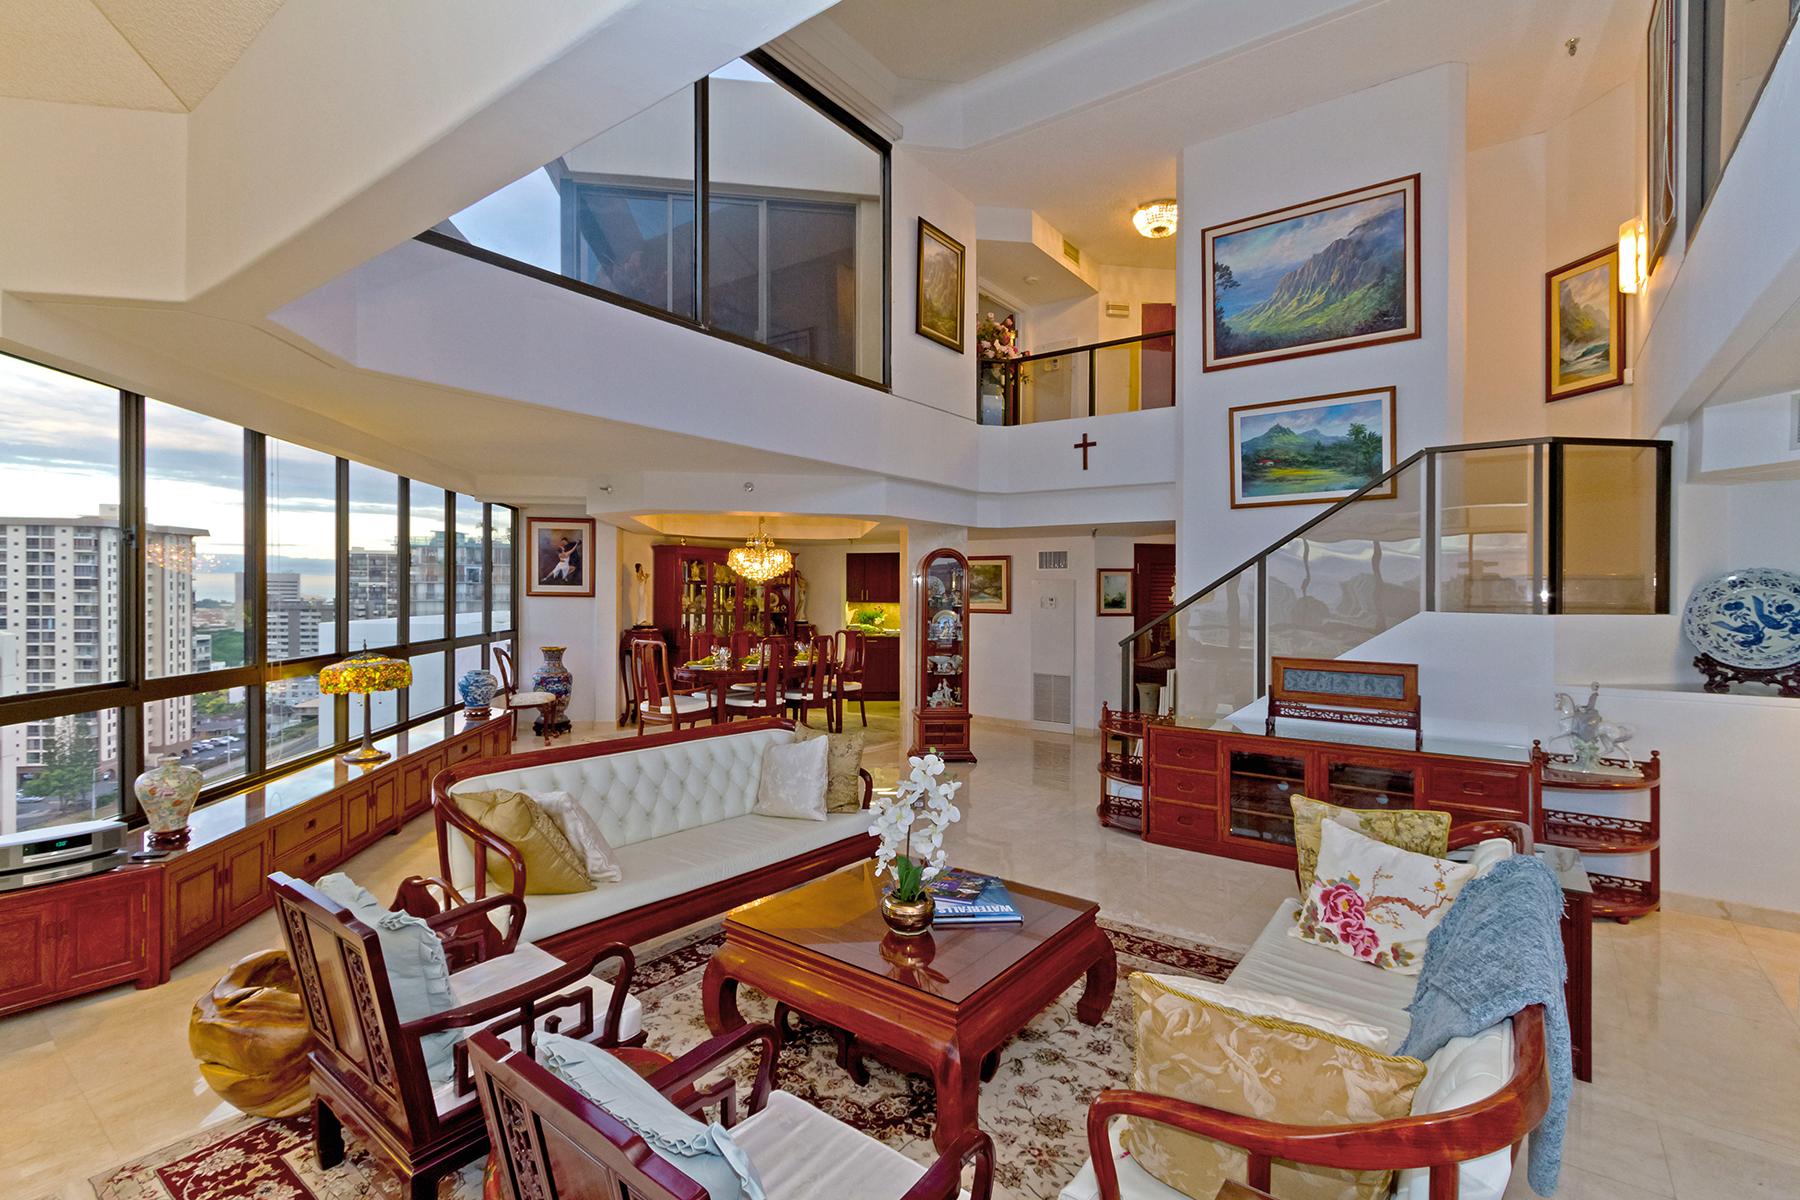 Condominium for Sale at Unique Continental Plaza Penthouse Continental Plaza 1050 Lunalilo St PH5 Honolulu, Hawaii 96822 United States